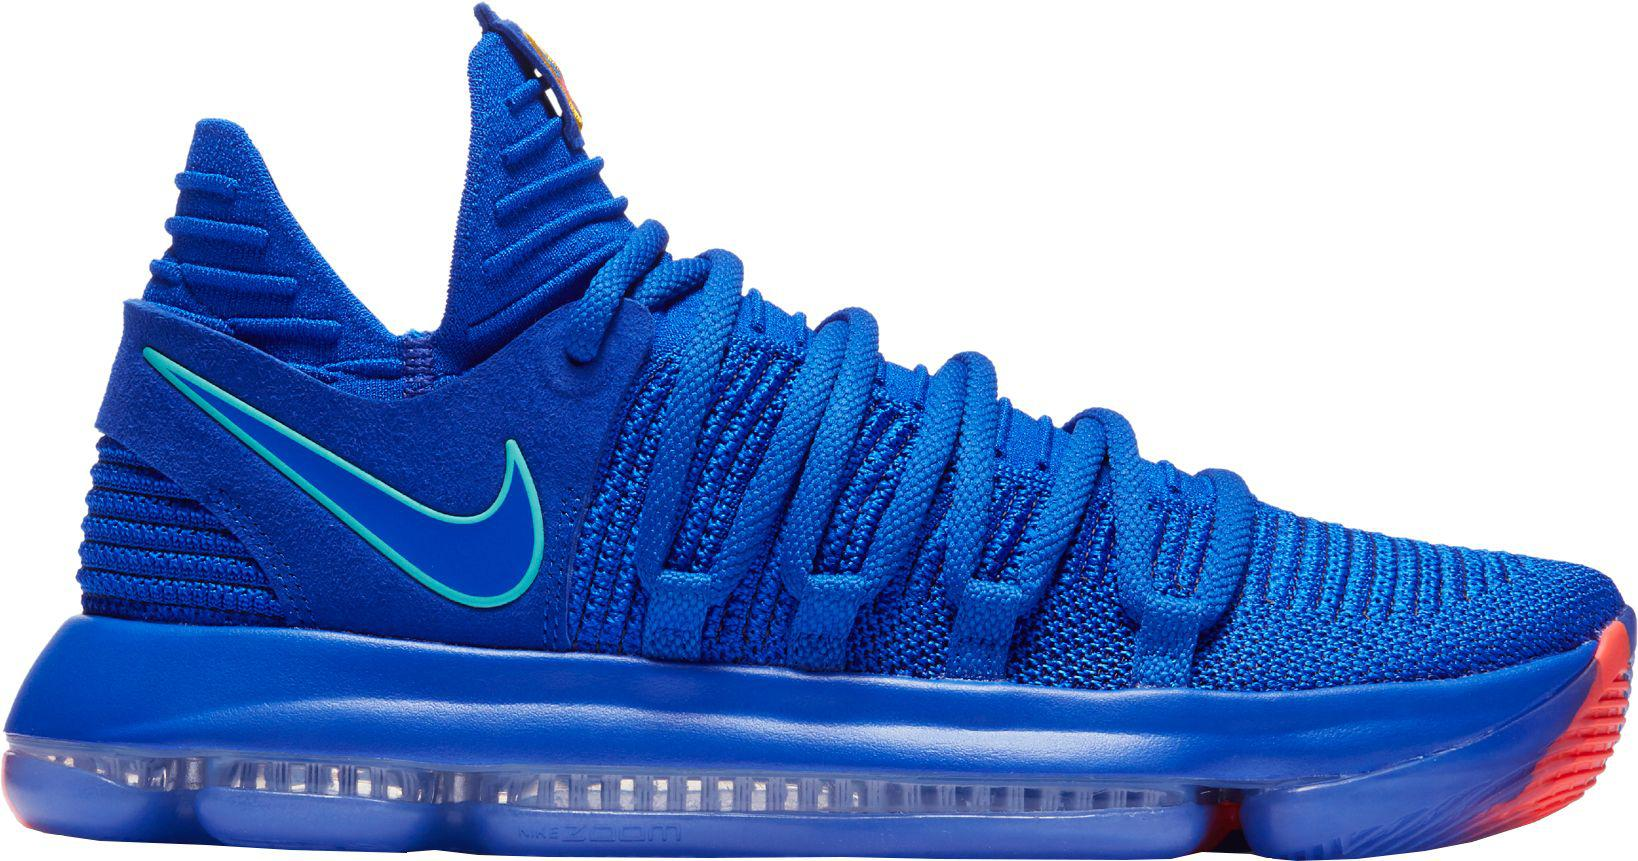 huge discount 8b3d2 716c1 Nike Mens Zoom KD 10 Basketball Shoes DICKS Sporting Goods ...